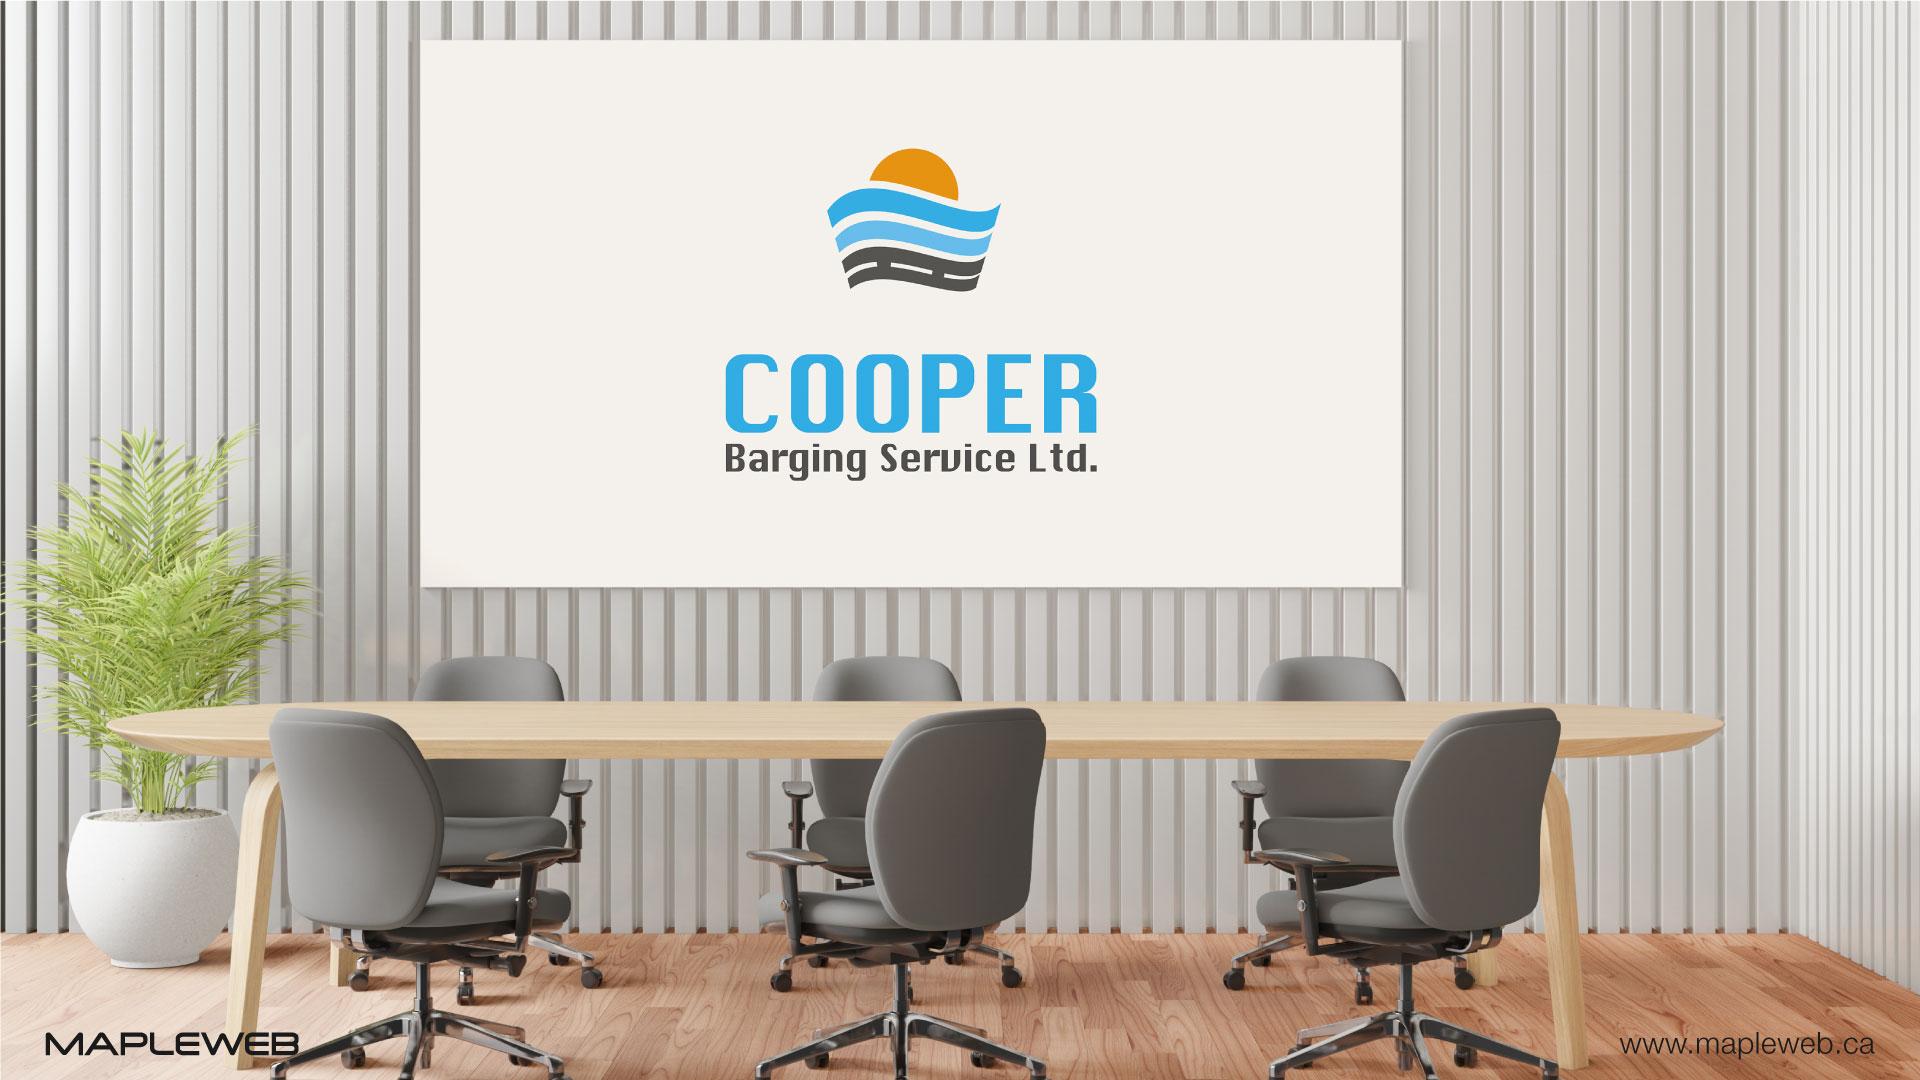 cooper-barging-service-brand-logo-design-by-mapleweb-vancouver-canada-scenery-mock